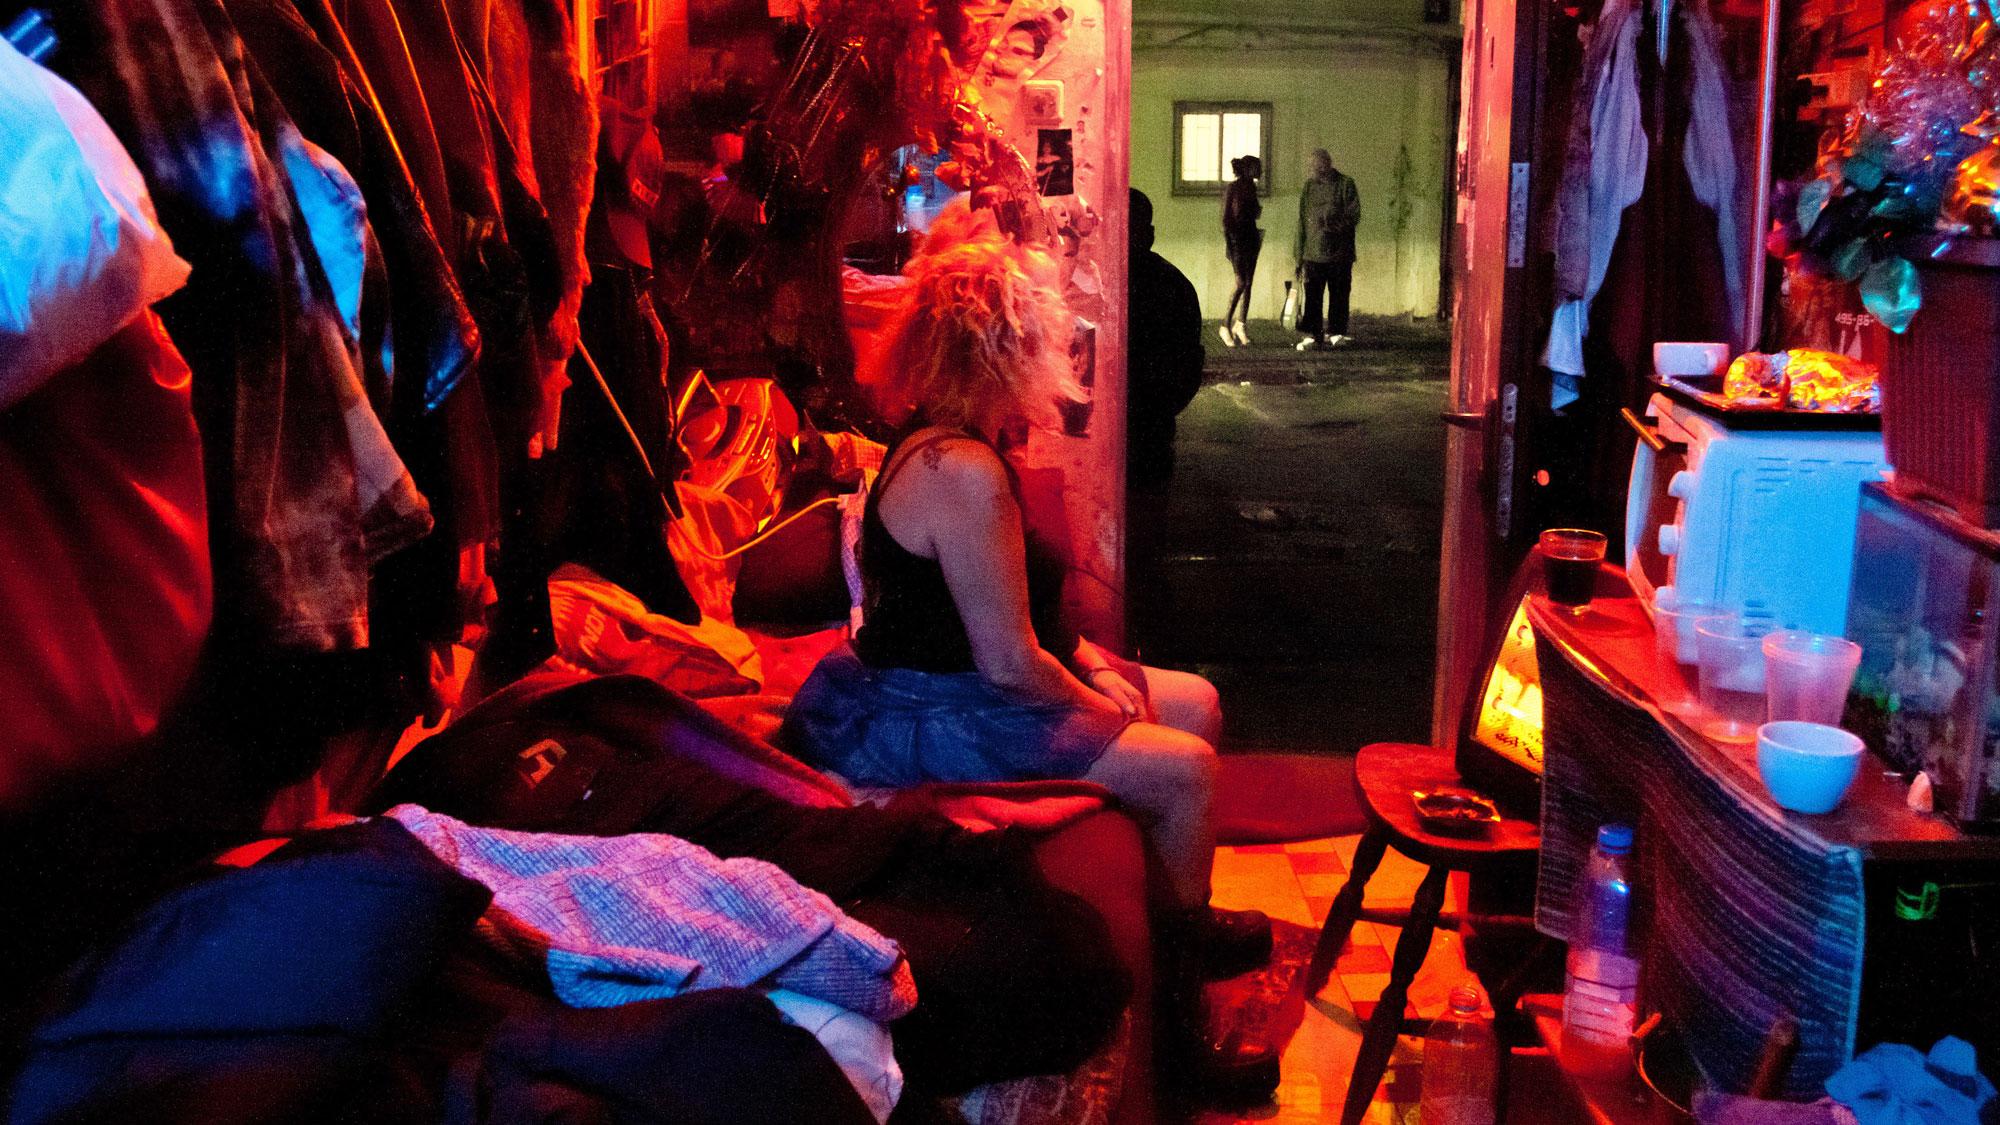 Why do girls go into prostitution